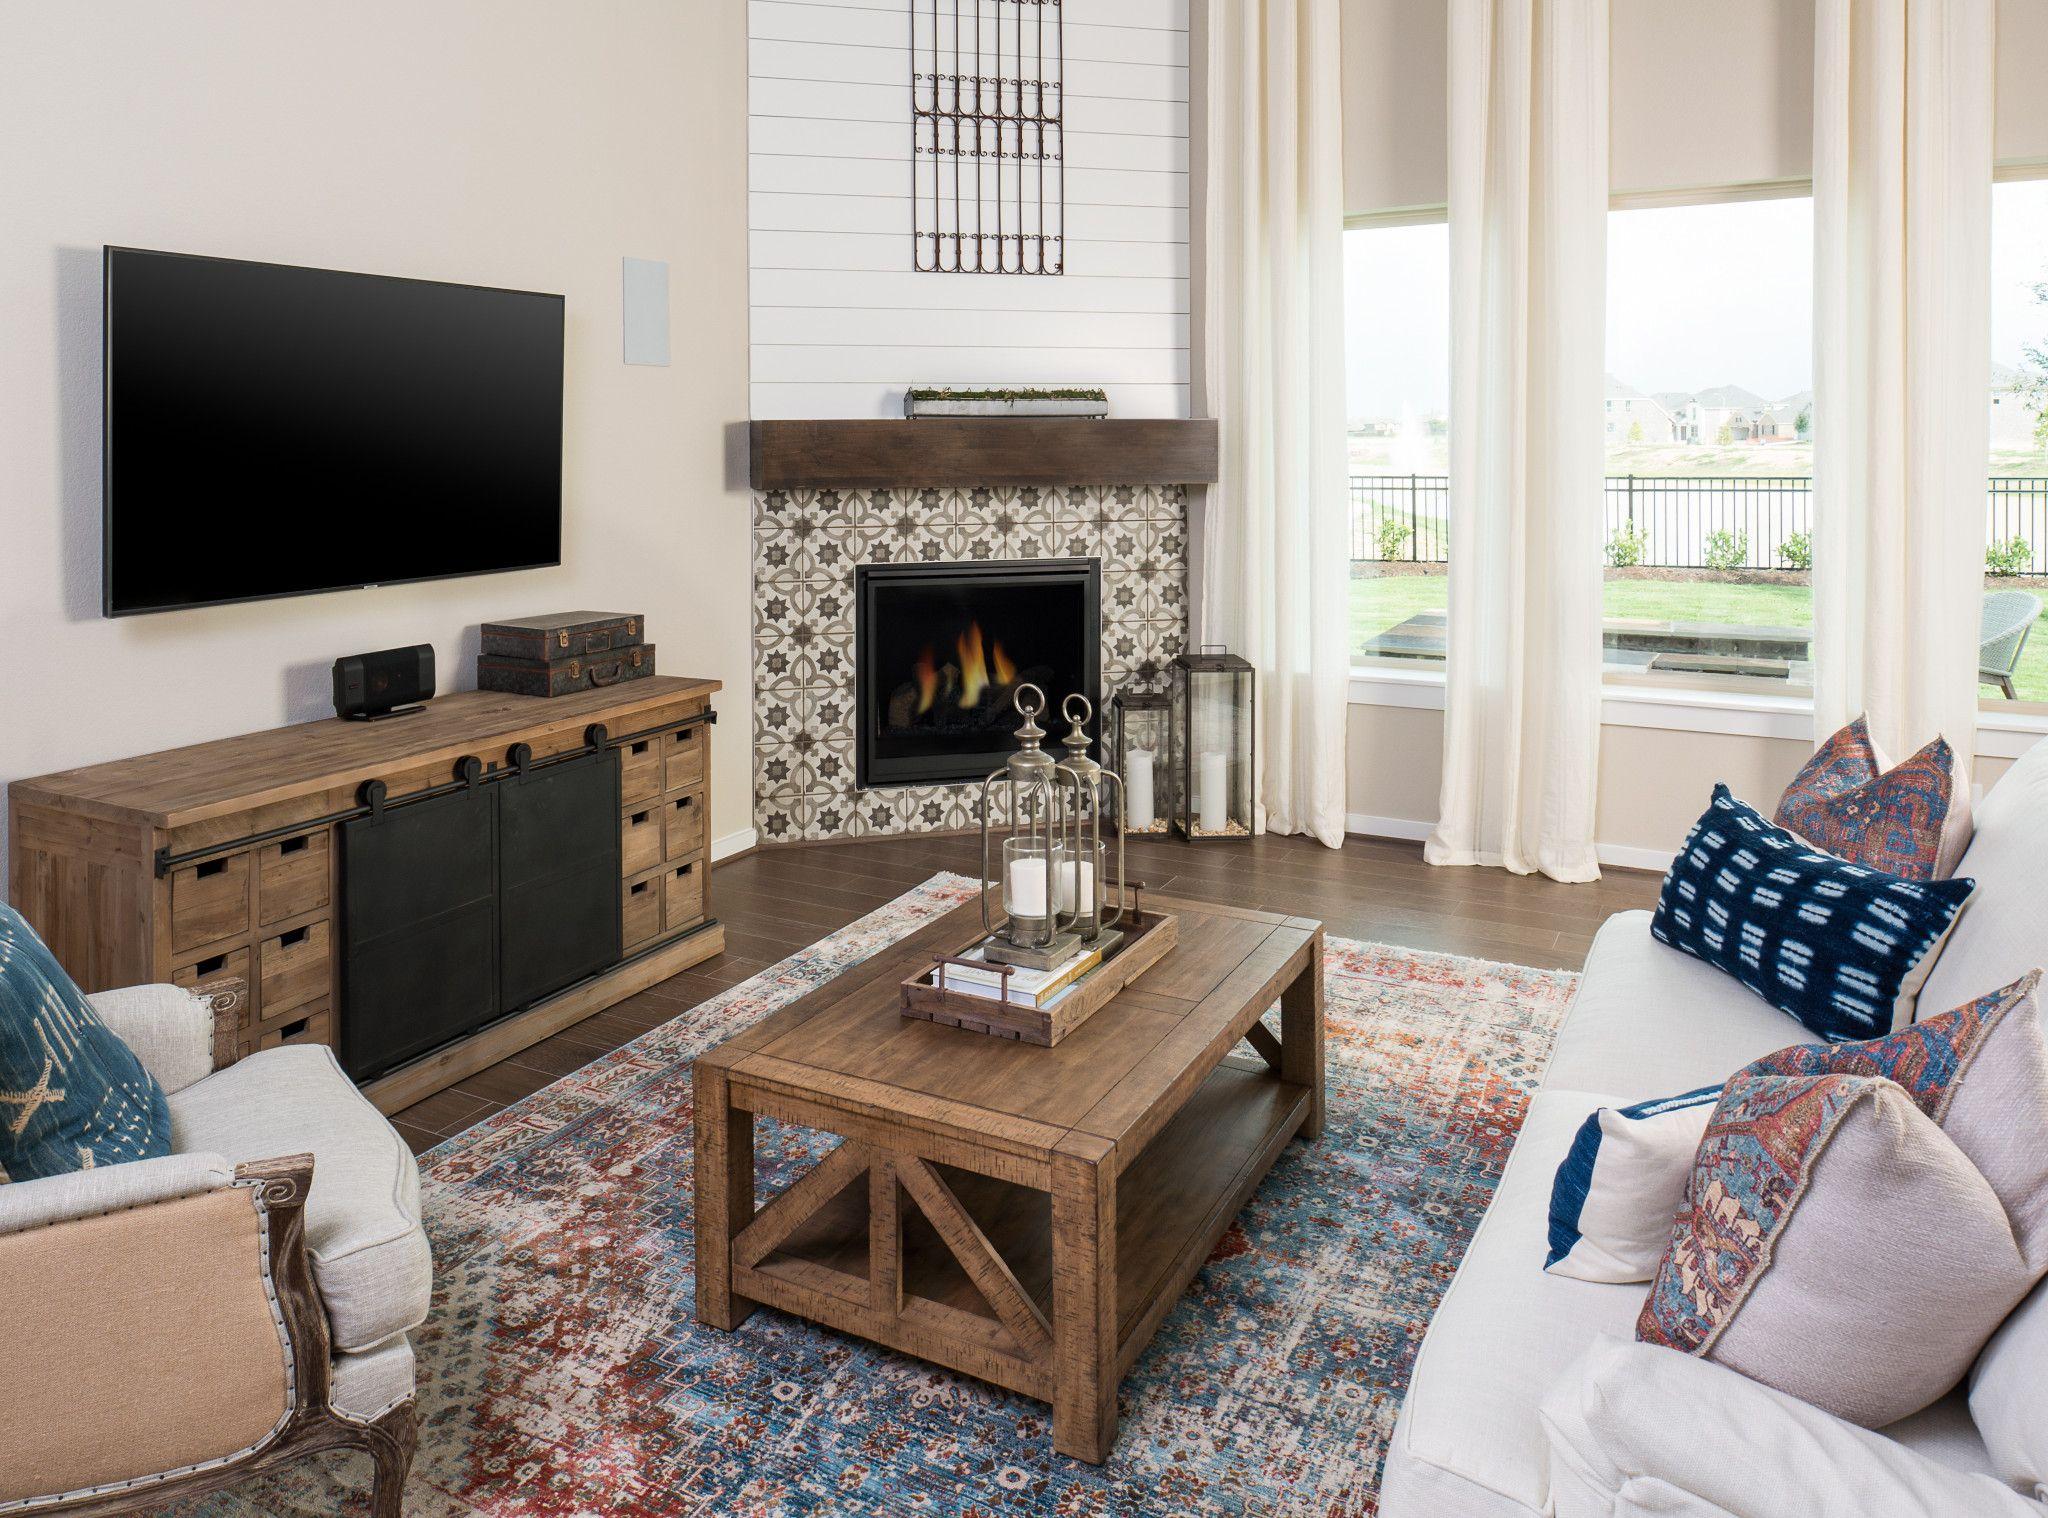 HOU_LakesofBellaTerraWest_Famile_Living_Room1